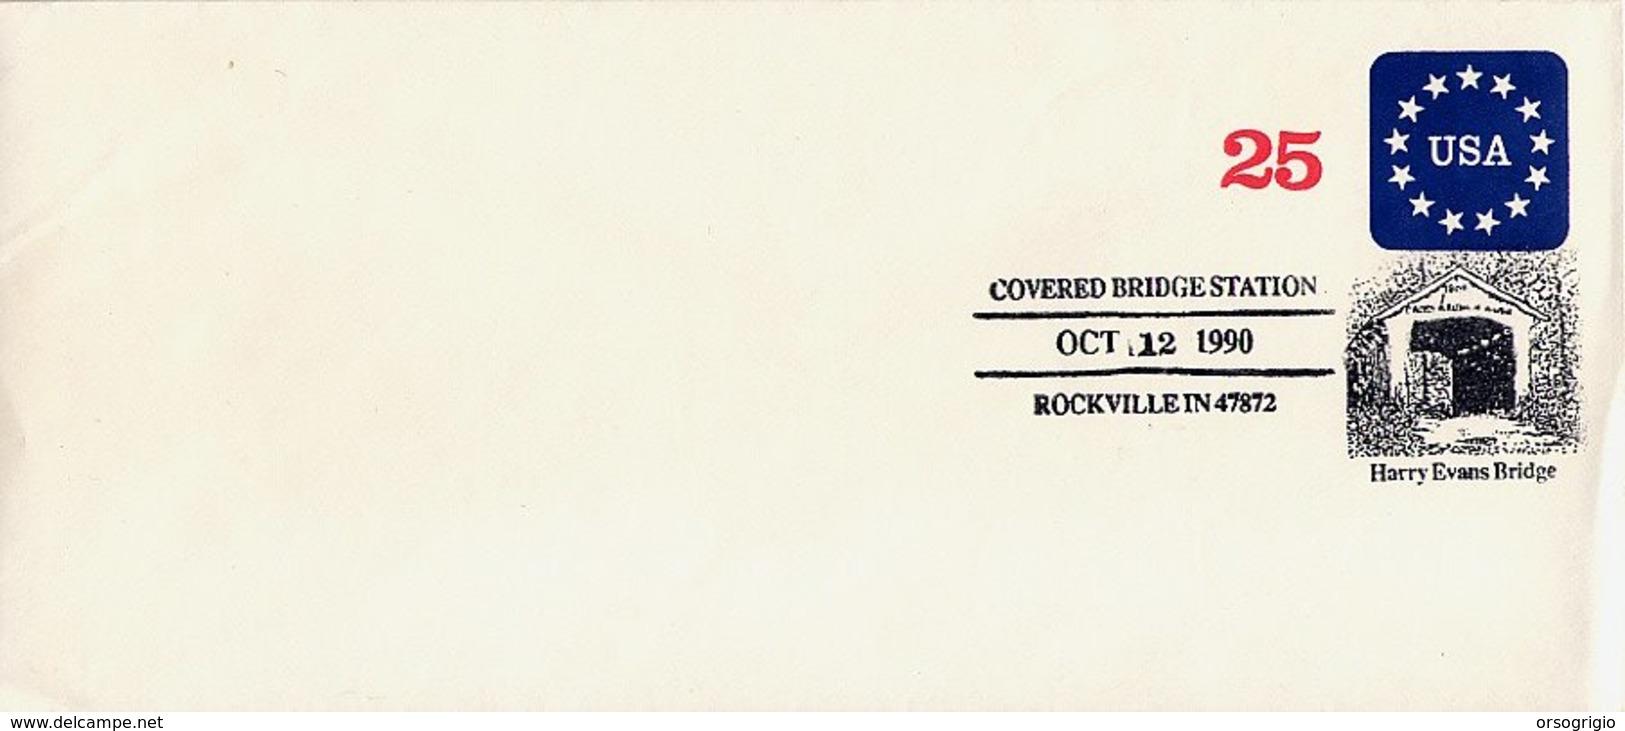 USA - ROCKVILLE  IN  -  HARRY EVANS BRIDGE - COVERED BRIDGE - PONTE COPERTO - Ponti